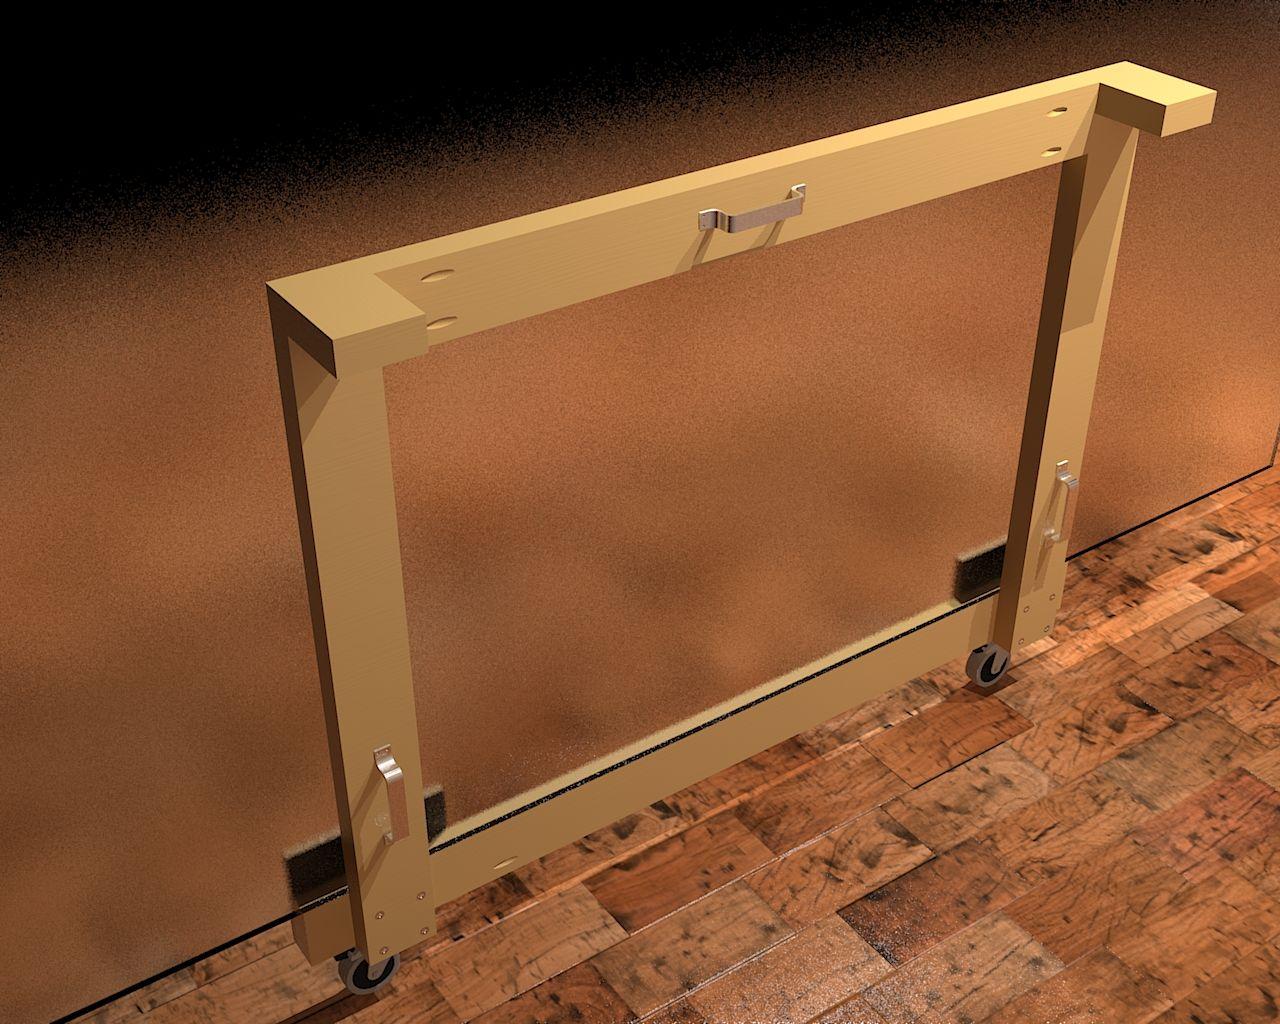 Diy Drywall Plywood Panel Carrier Diy Tool And Jig